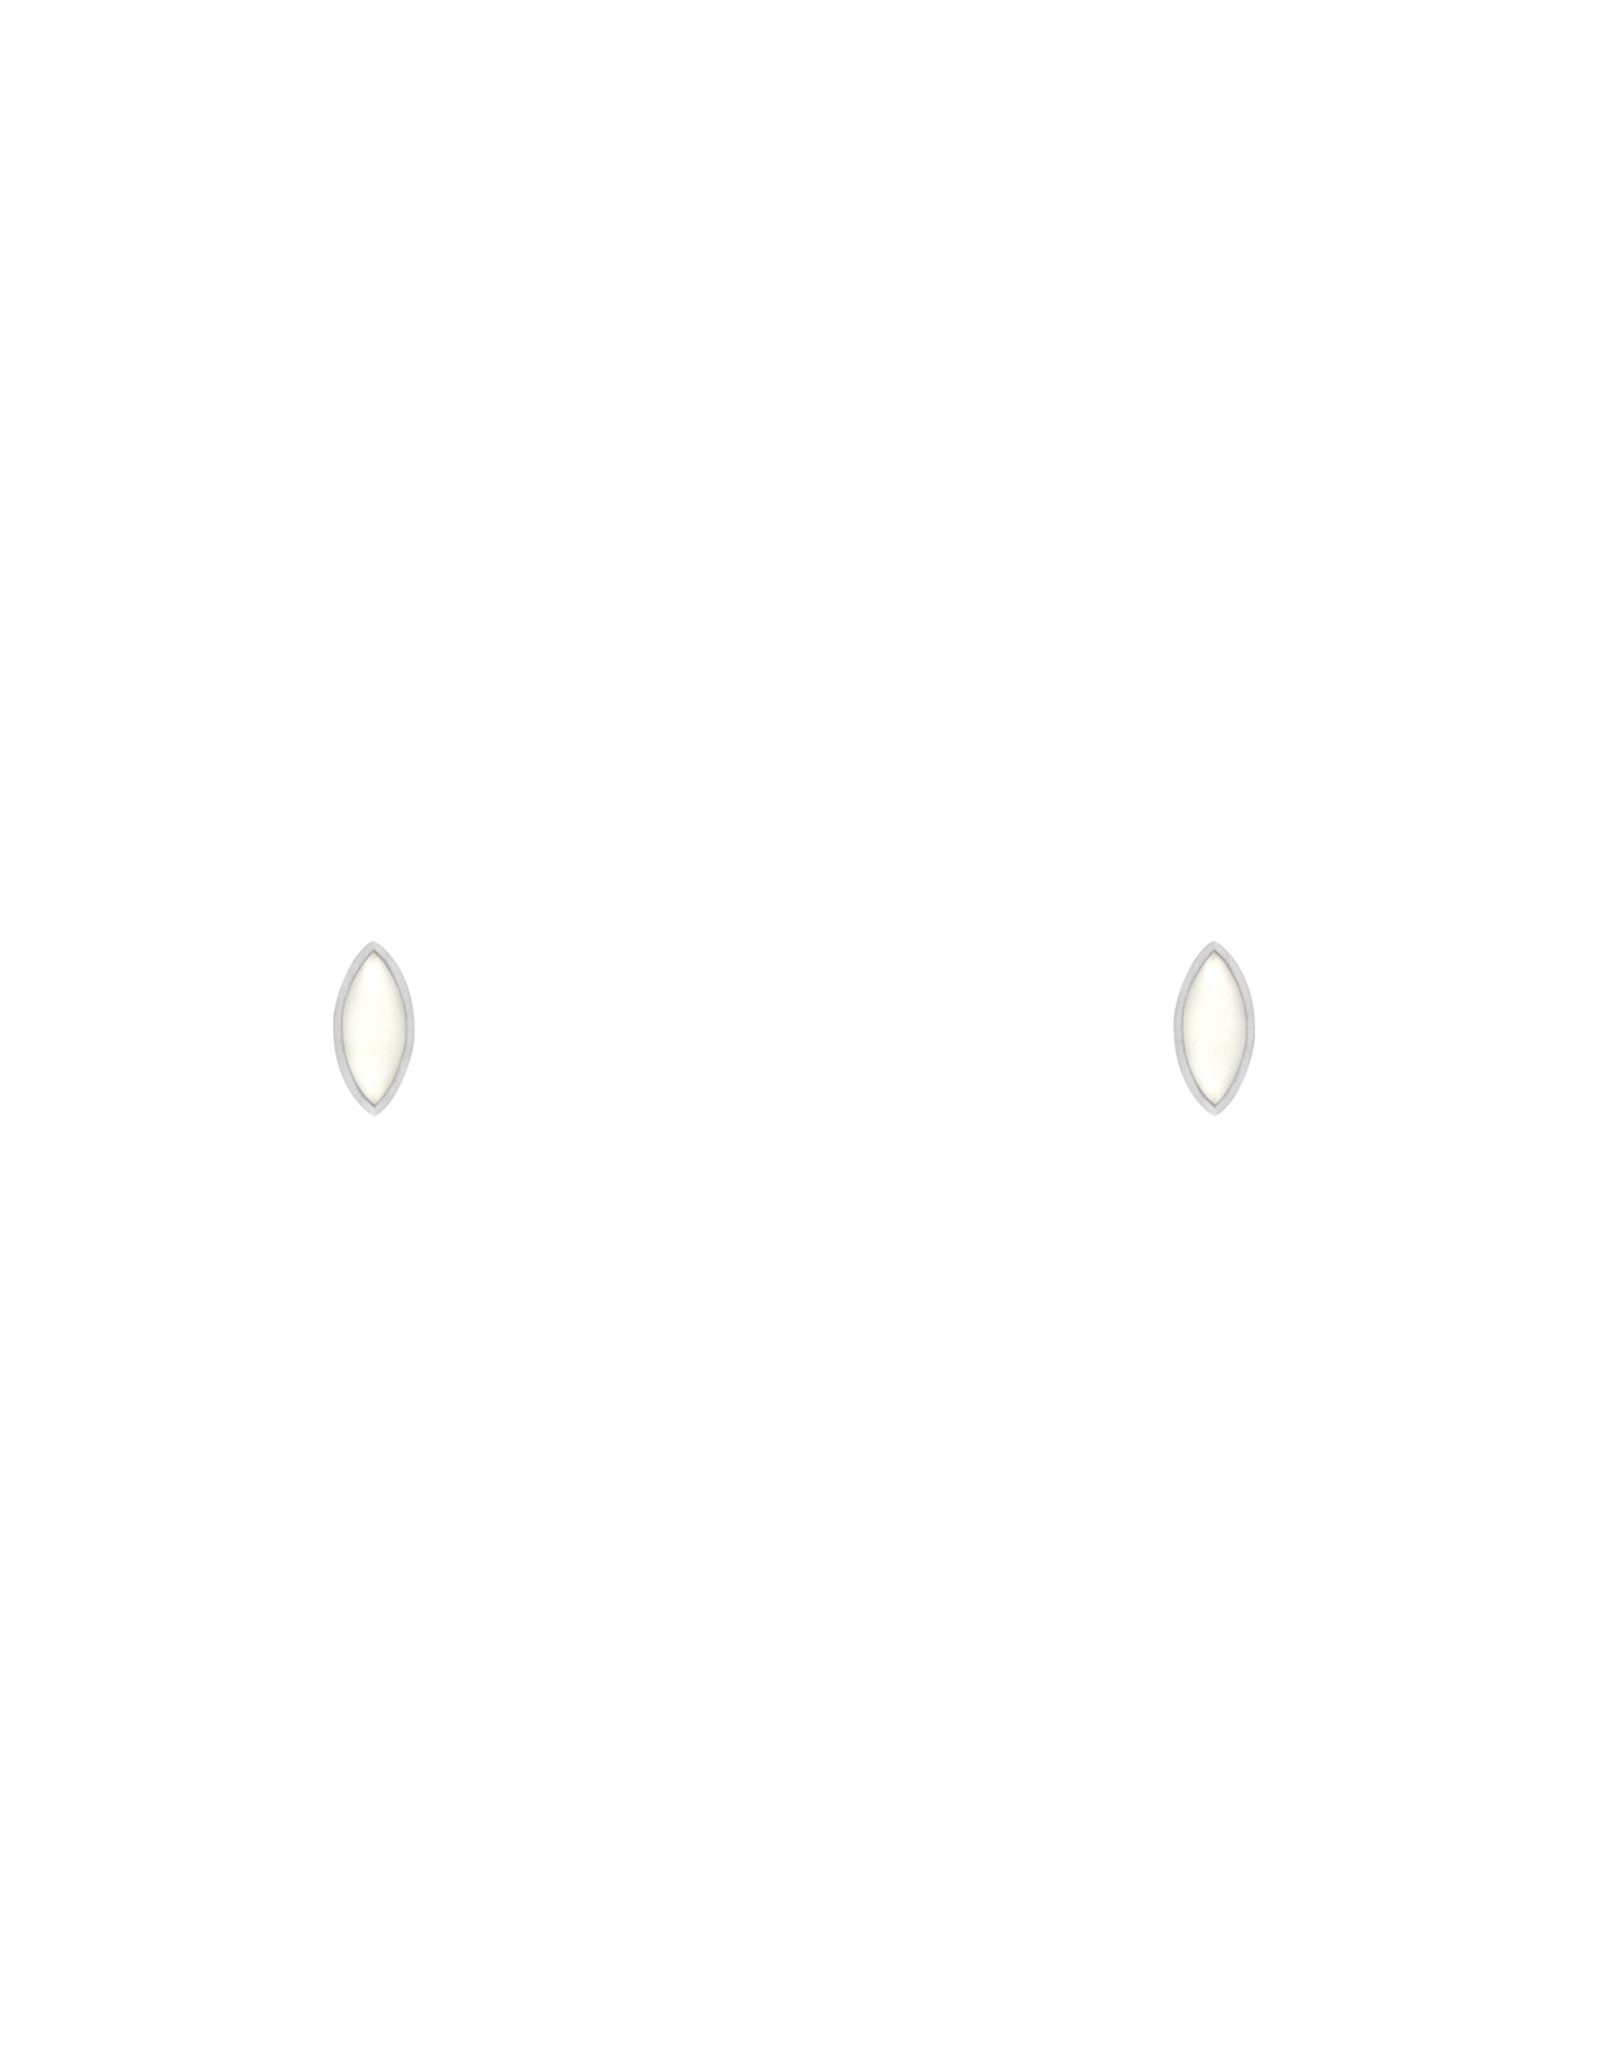 Flawed Ivory Eye Studs-silver